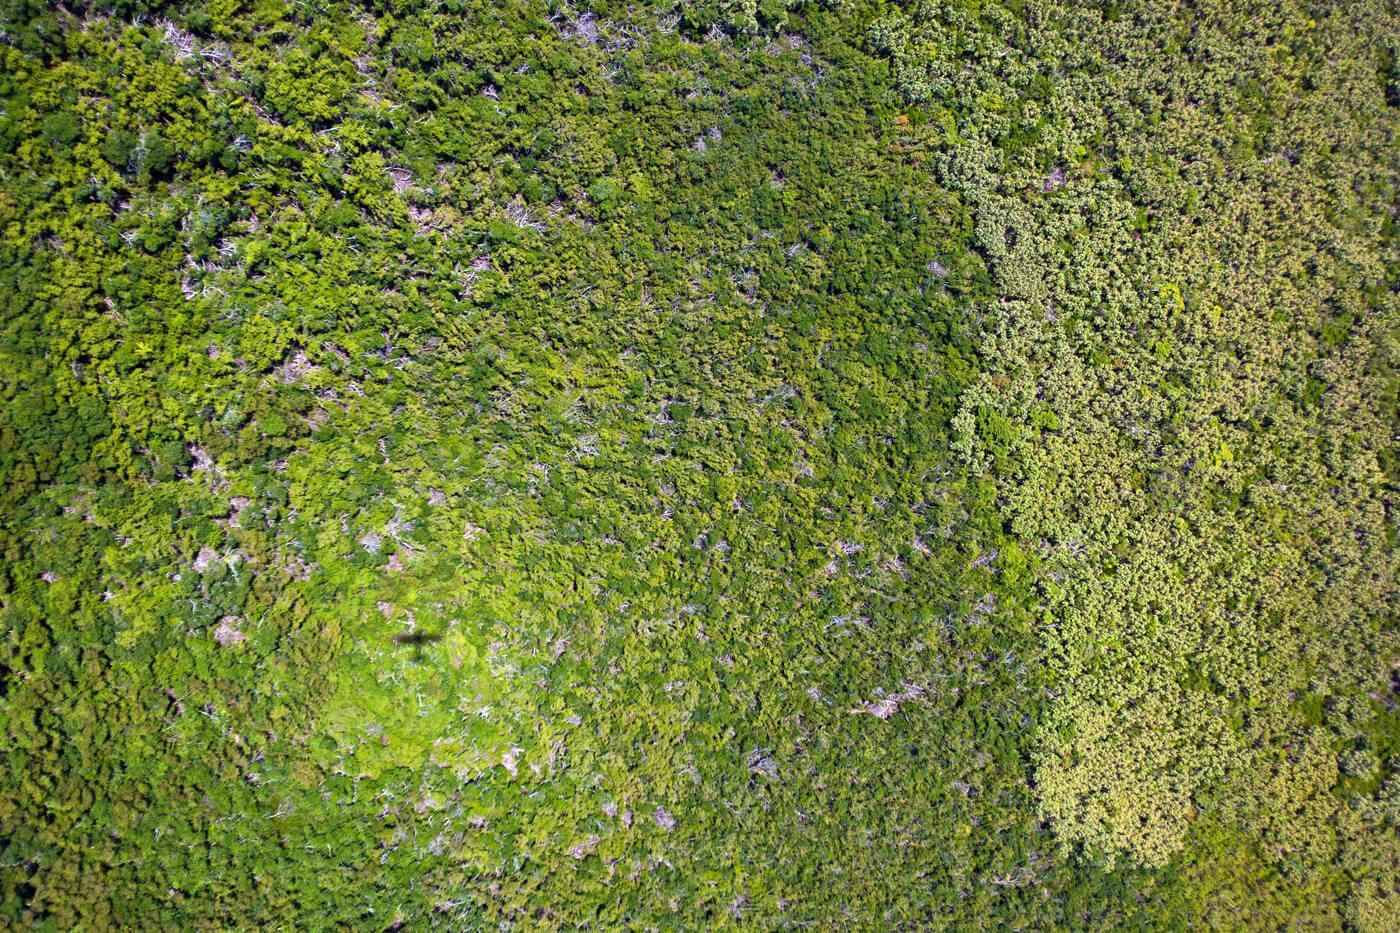 Belize is part of the Mesoamerican forest hotspot. © Tony Rath / tonyrath.com